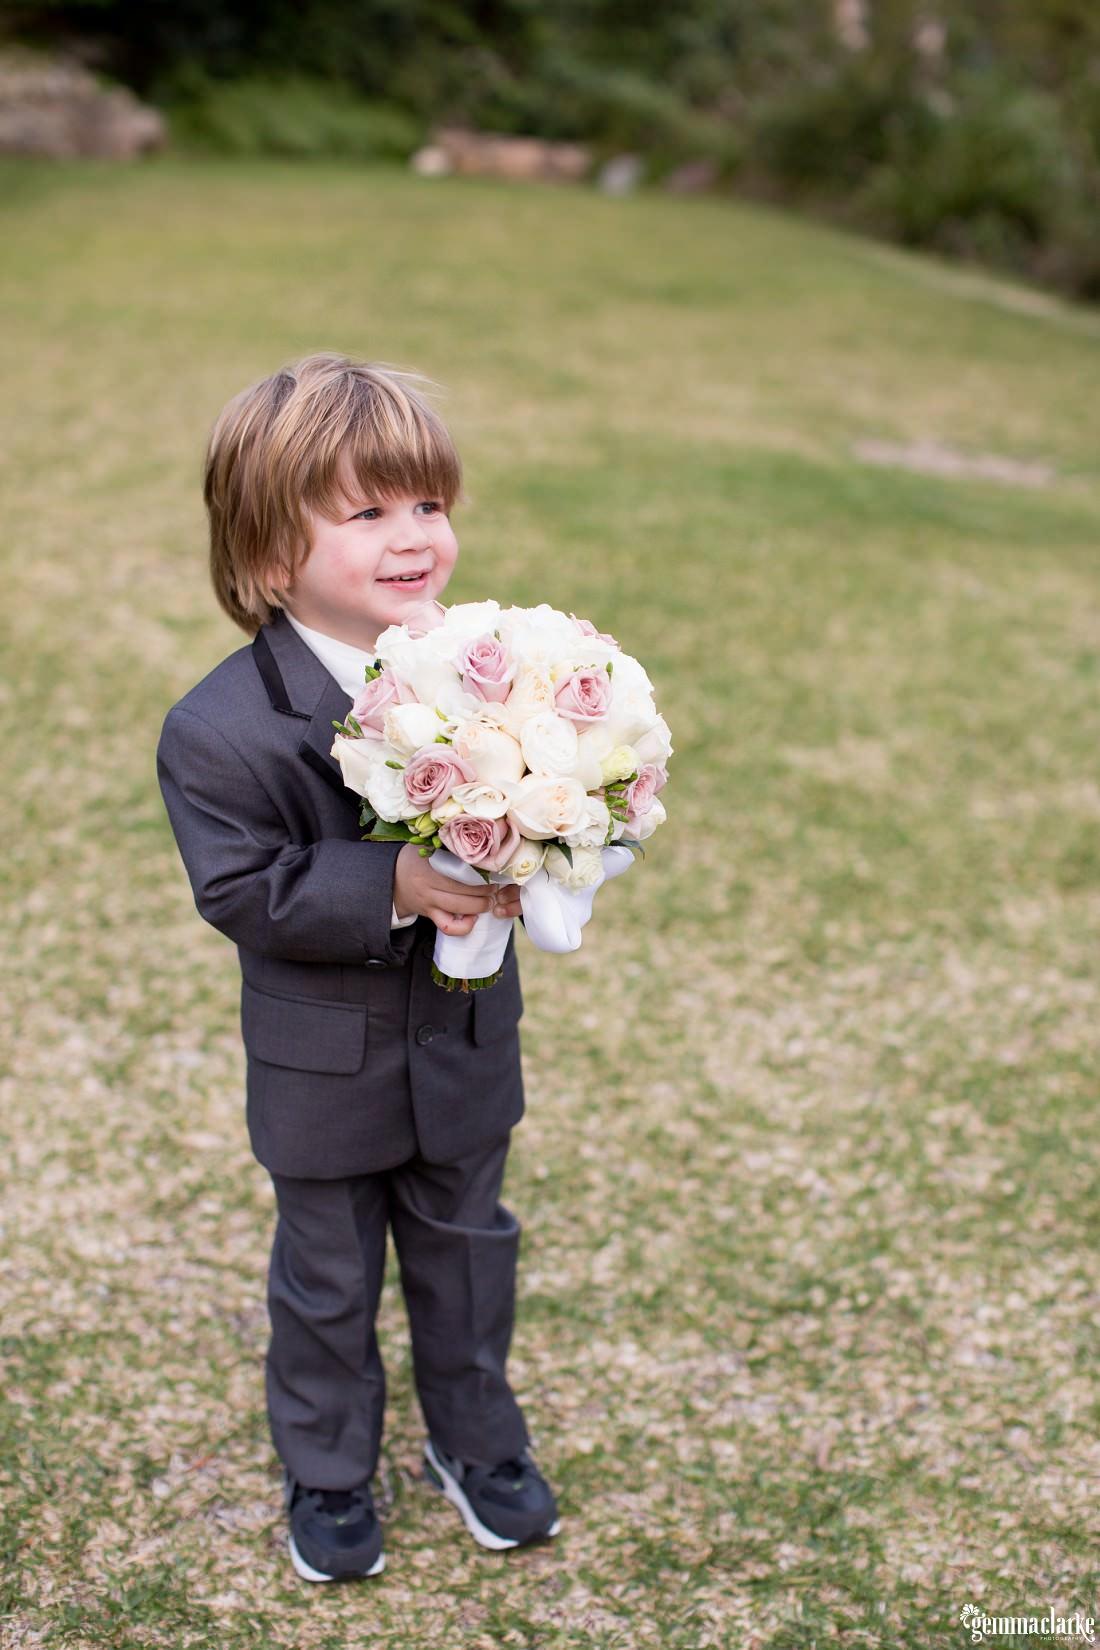 gemma-clarke-photography_gunners-barracks-wedding_tearooms-wedding_ellie-and-sam_0050